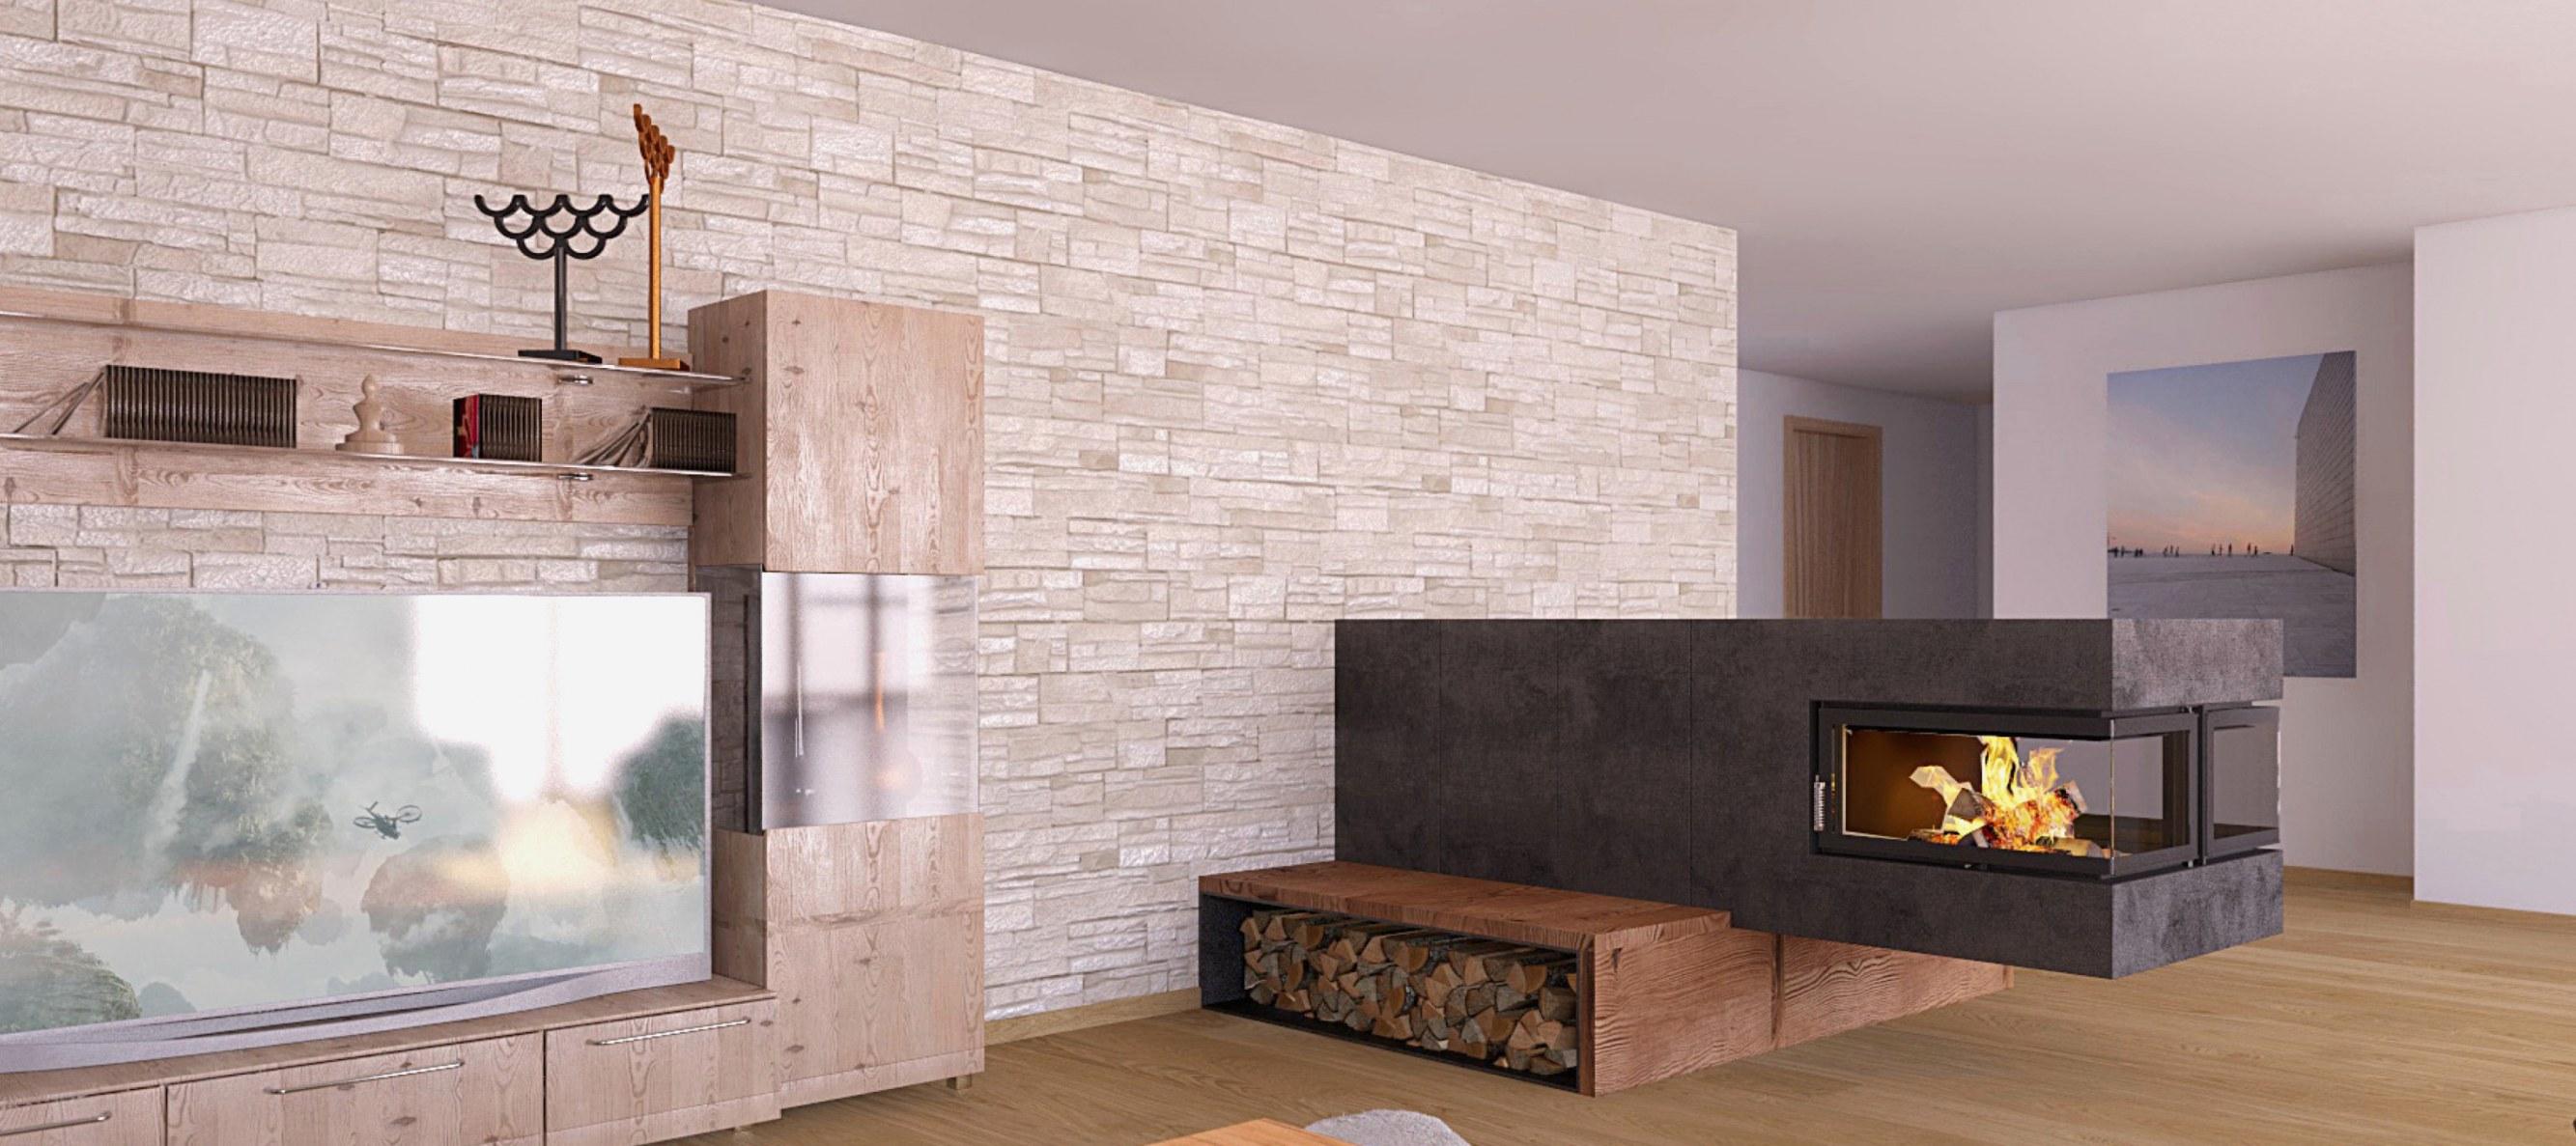 corner fireplace designs fake stone fireplace homedesigninterior of corner fireplace designs